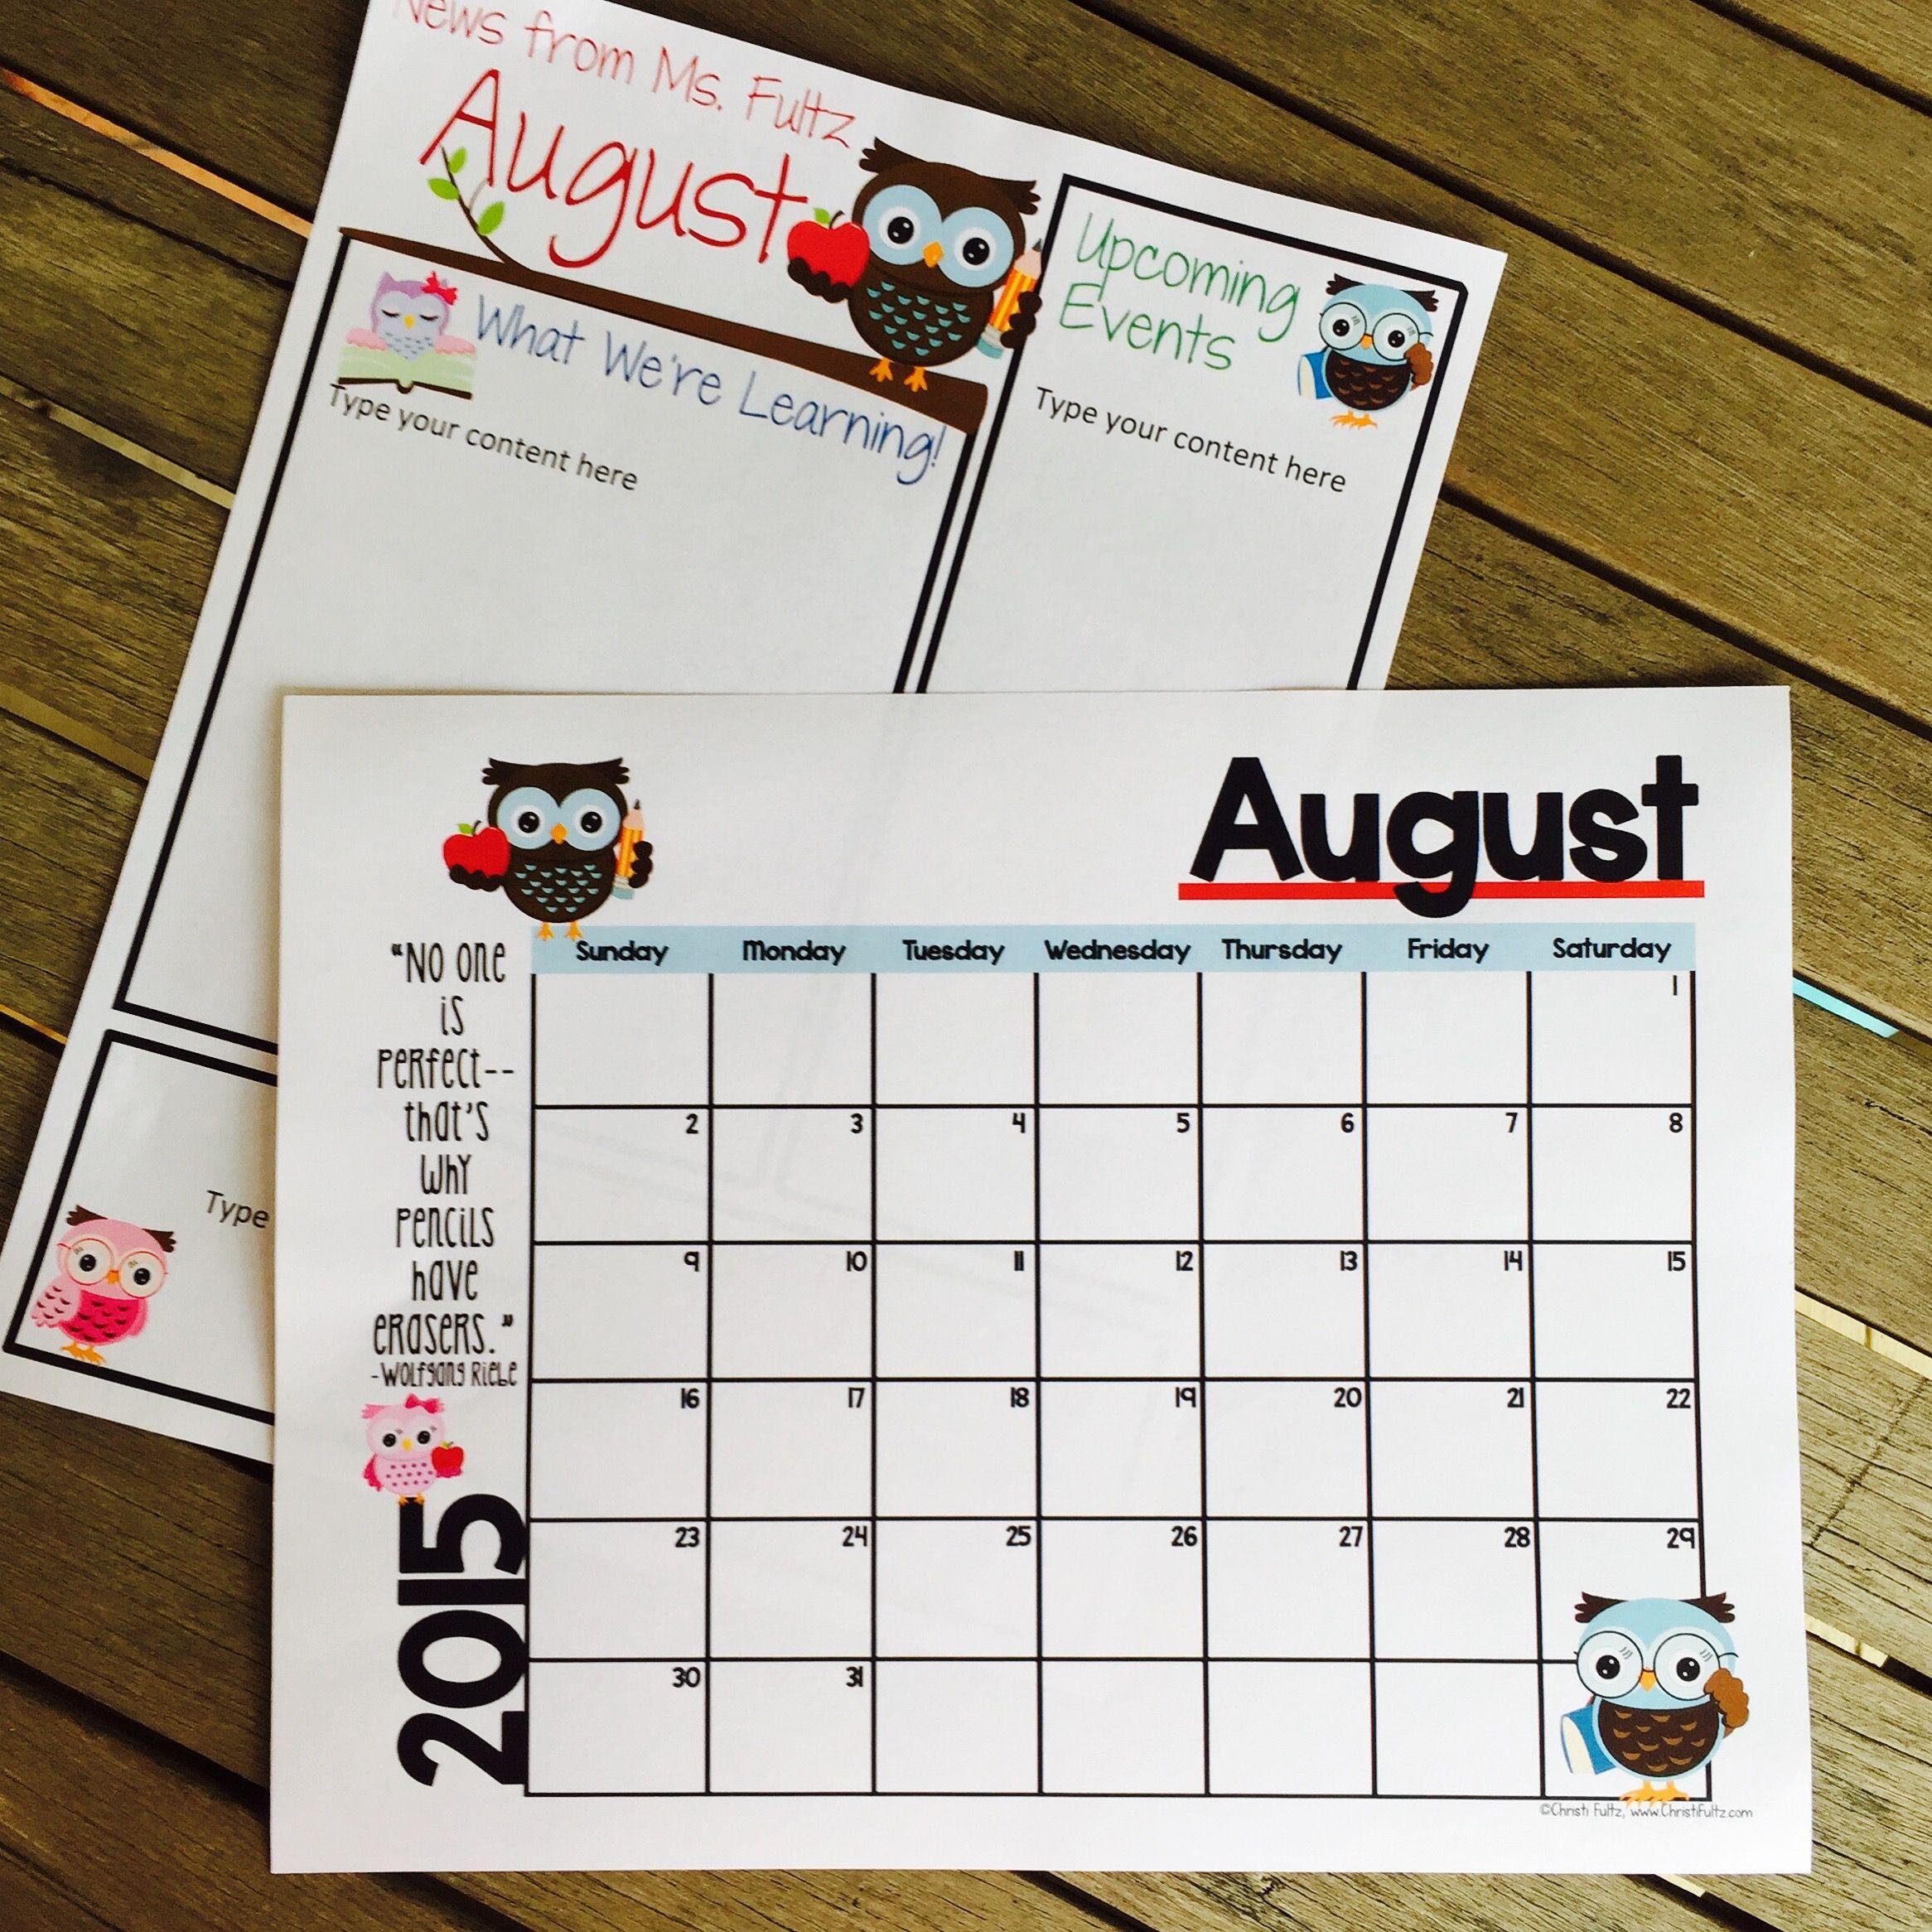 Editable Newsletter And Calendar Templates With A Seasonal Owl Theme within August Calendar Template For Pre K